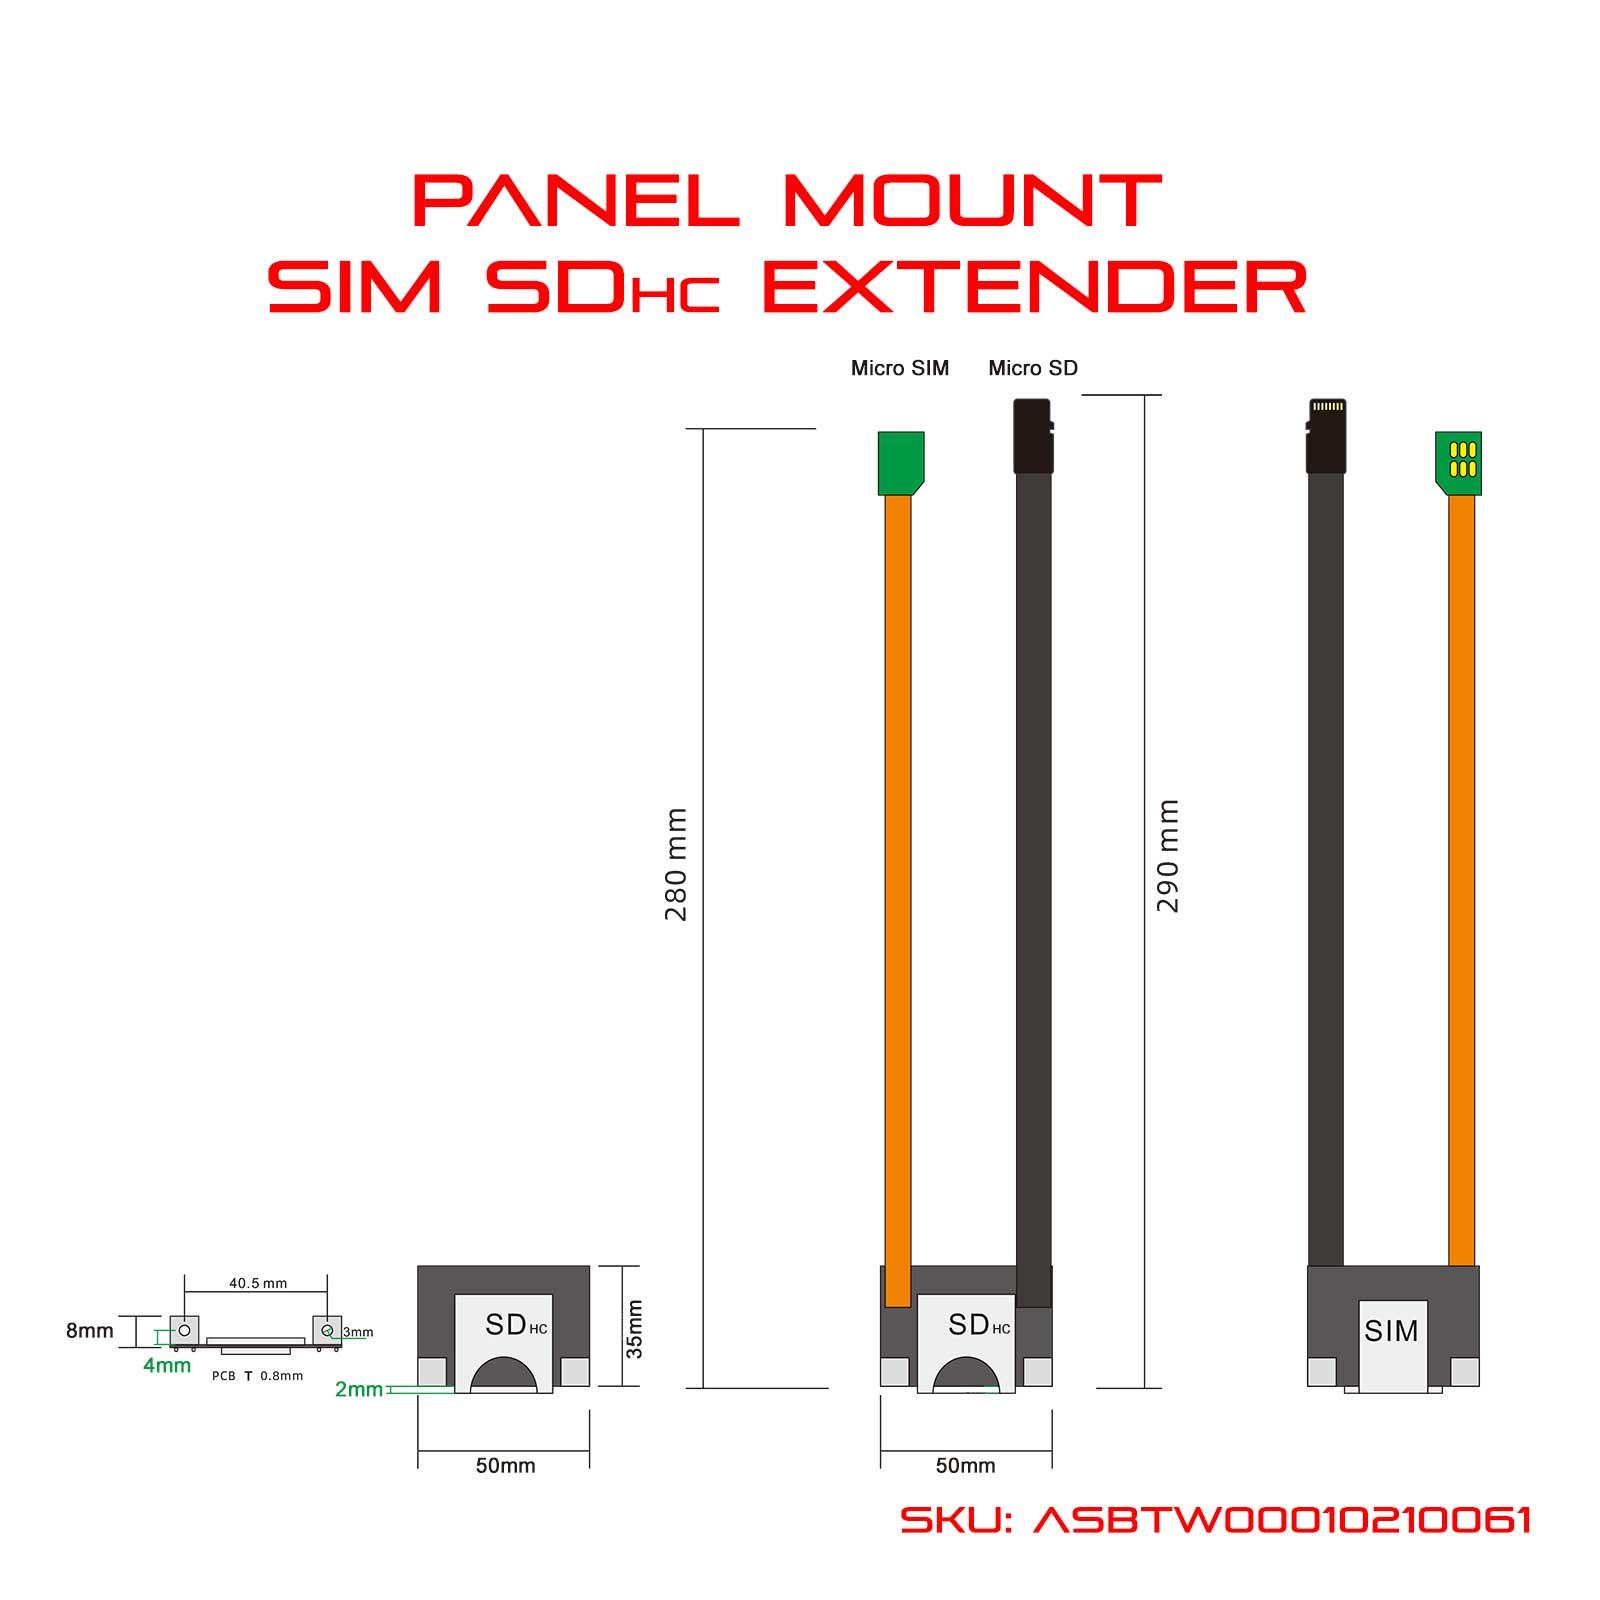 Panel Mount SIM SD Extender Diagram